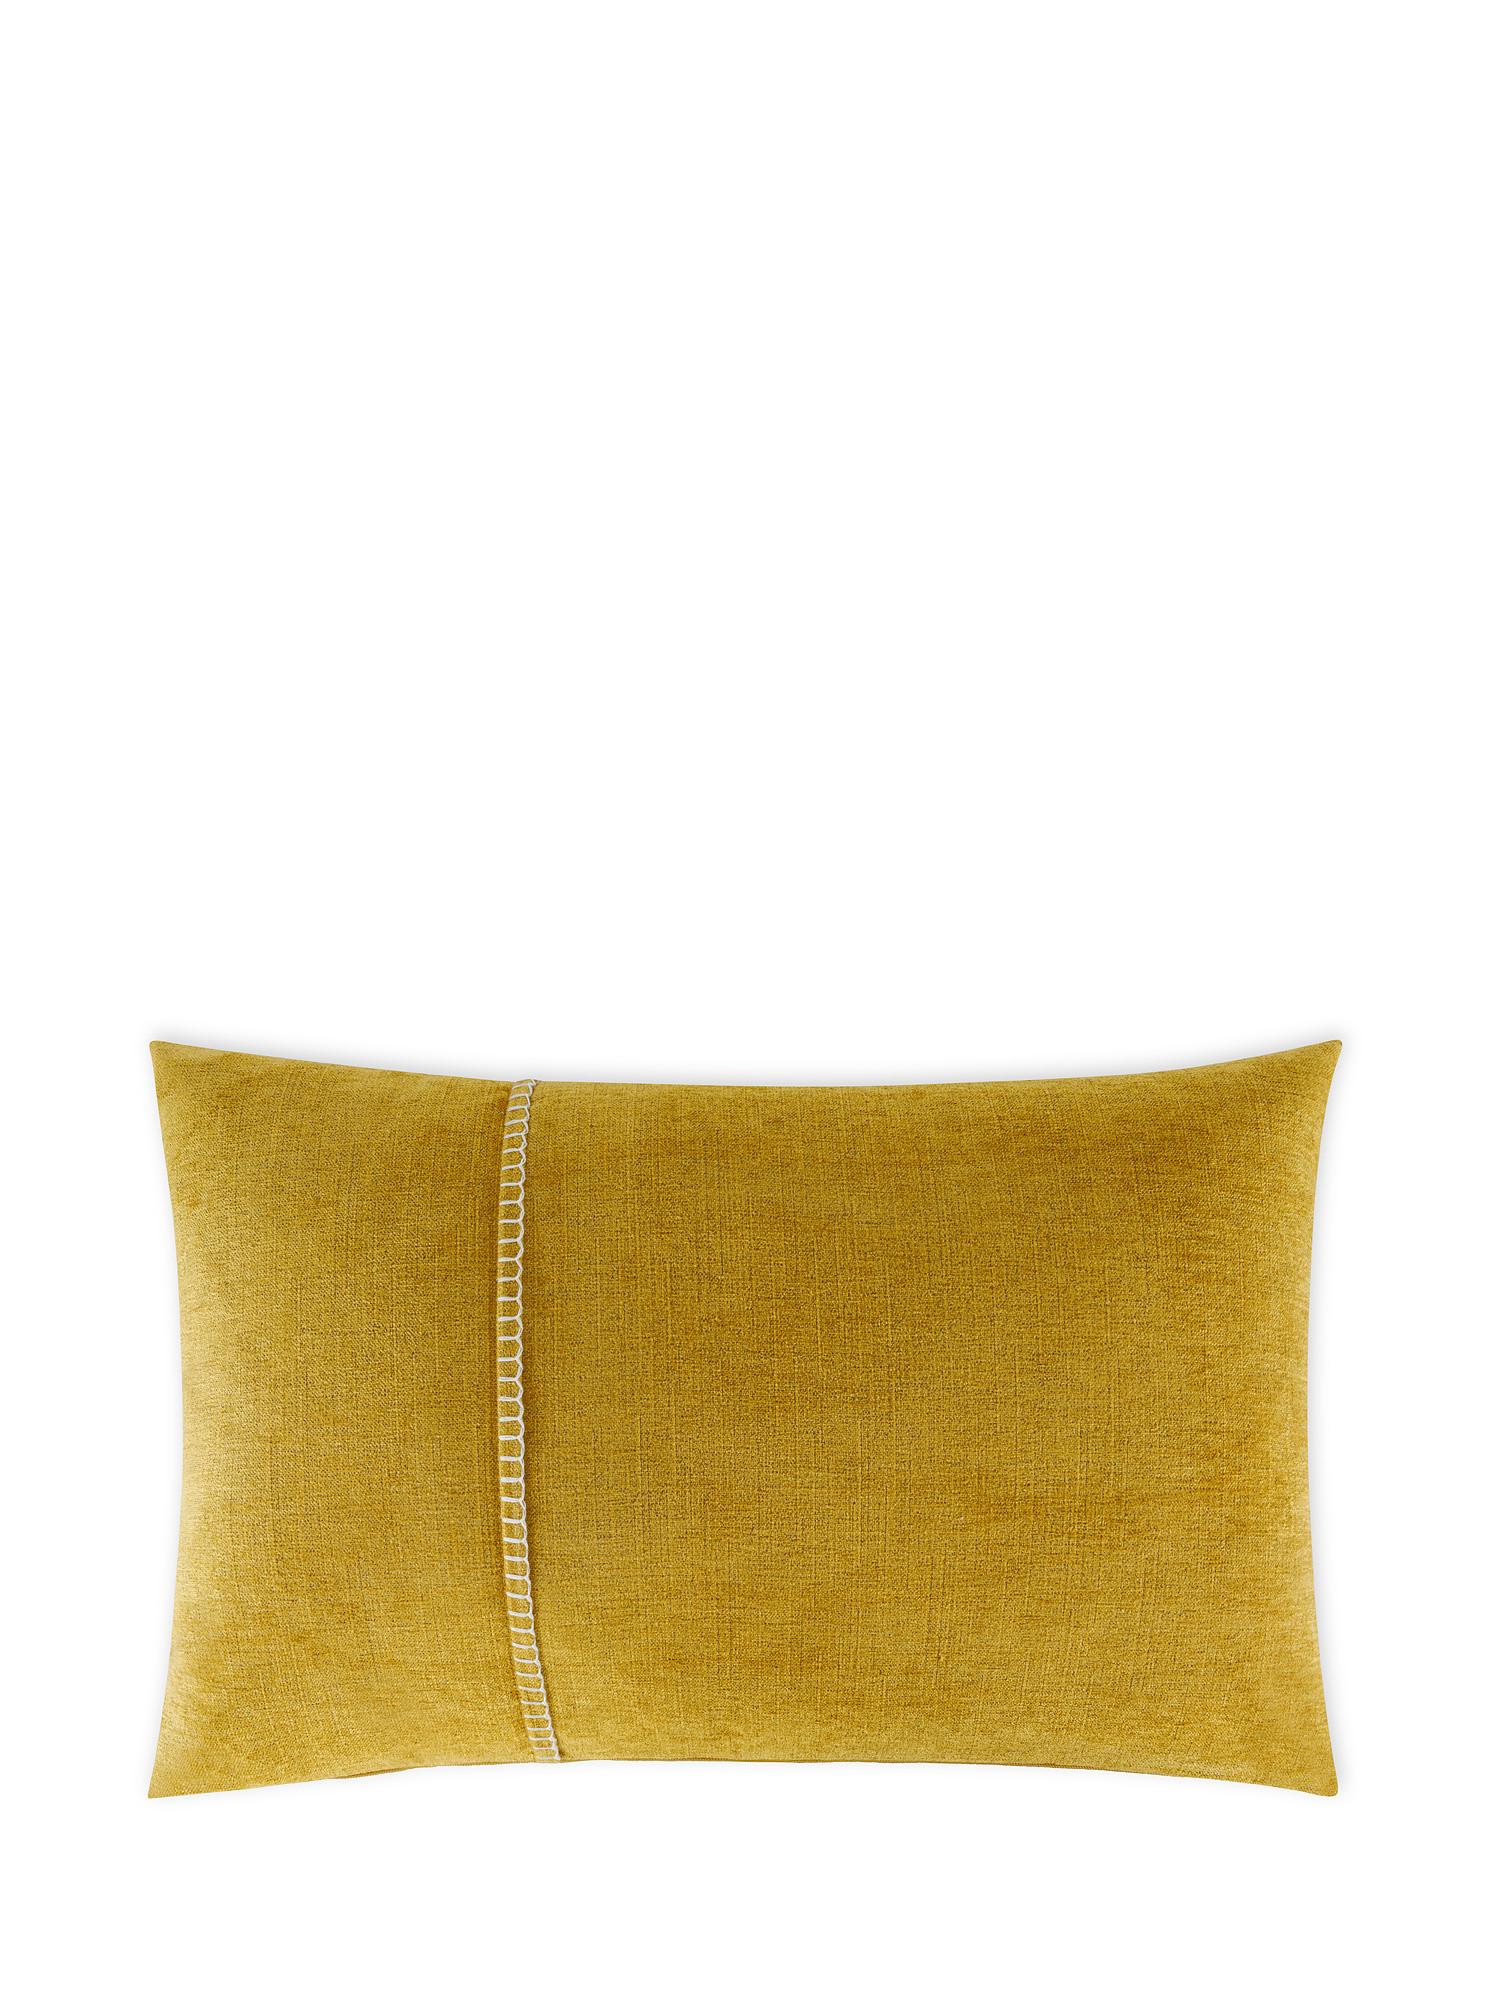 Cuscino velluto con ricamo 35x55cm, Multicolor, large image number 0